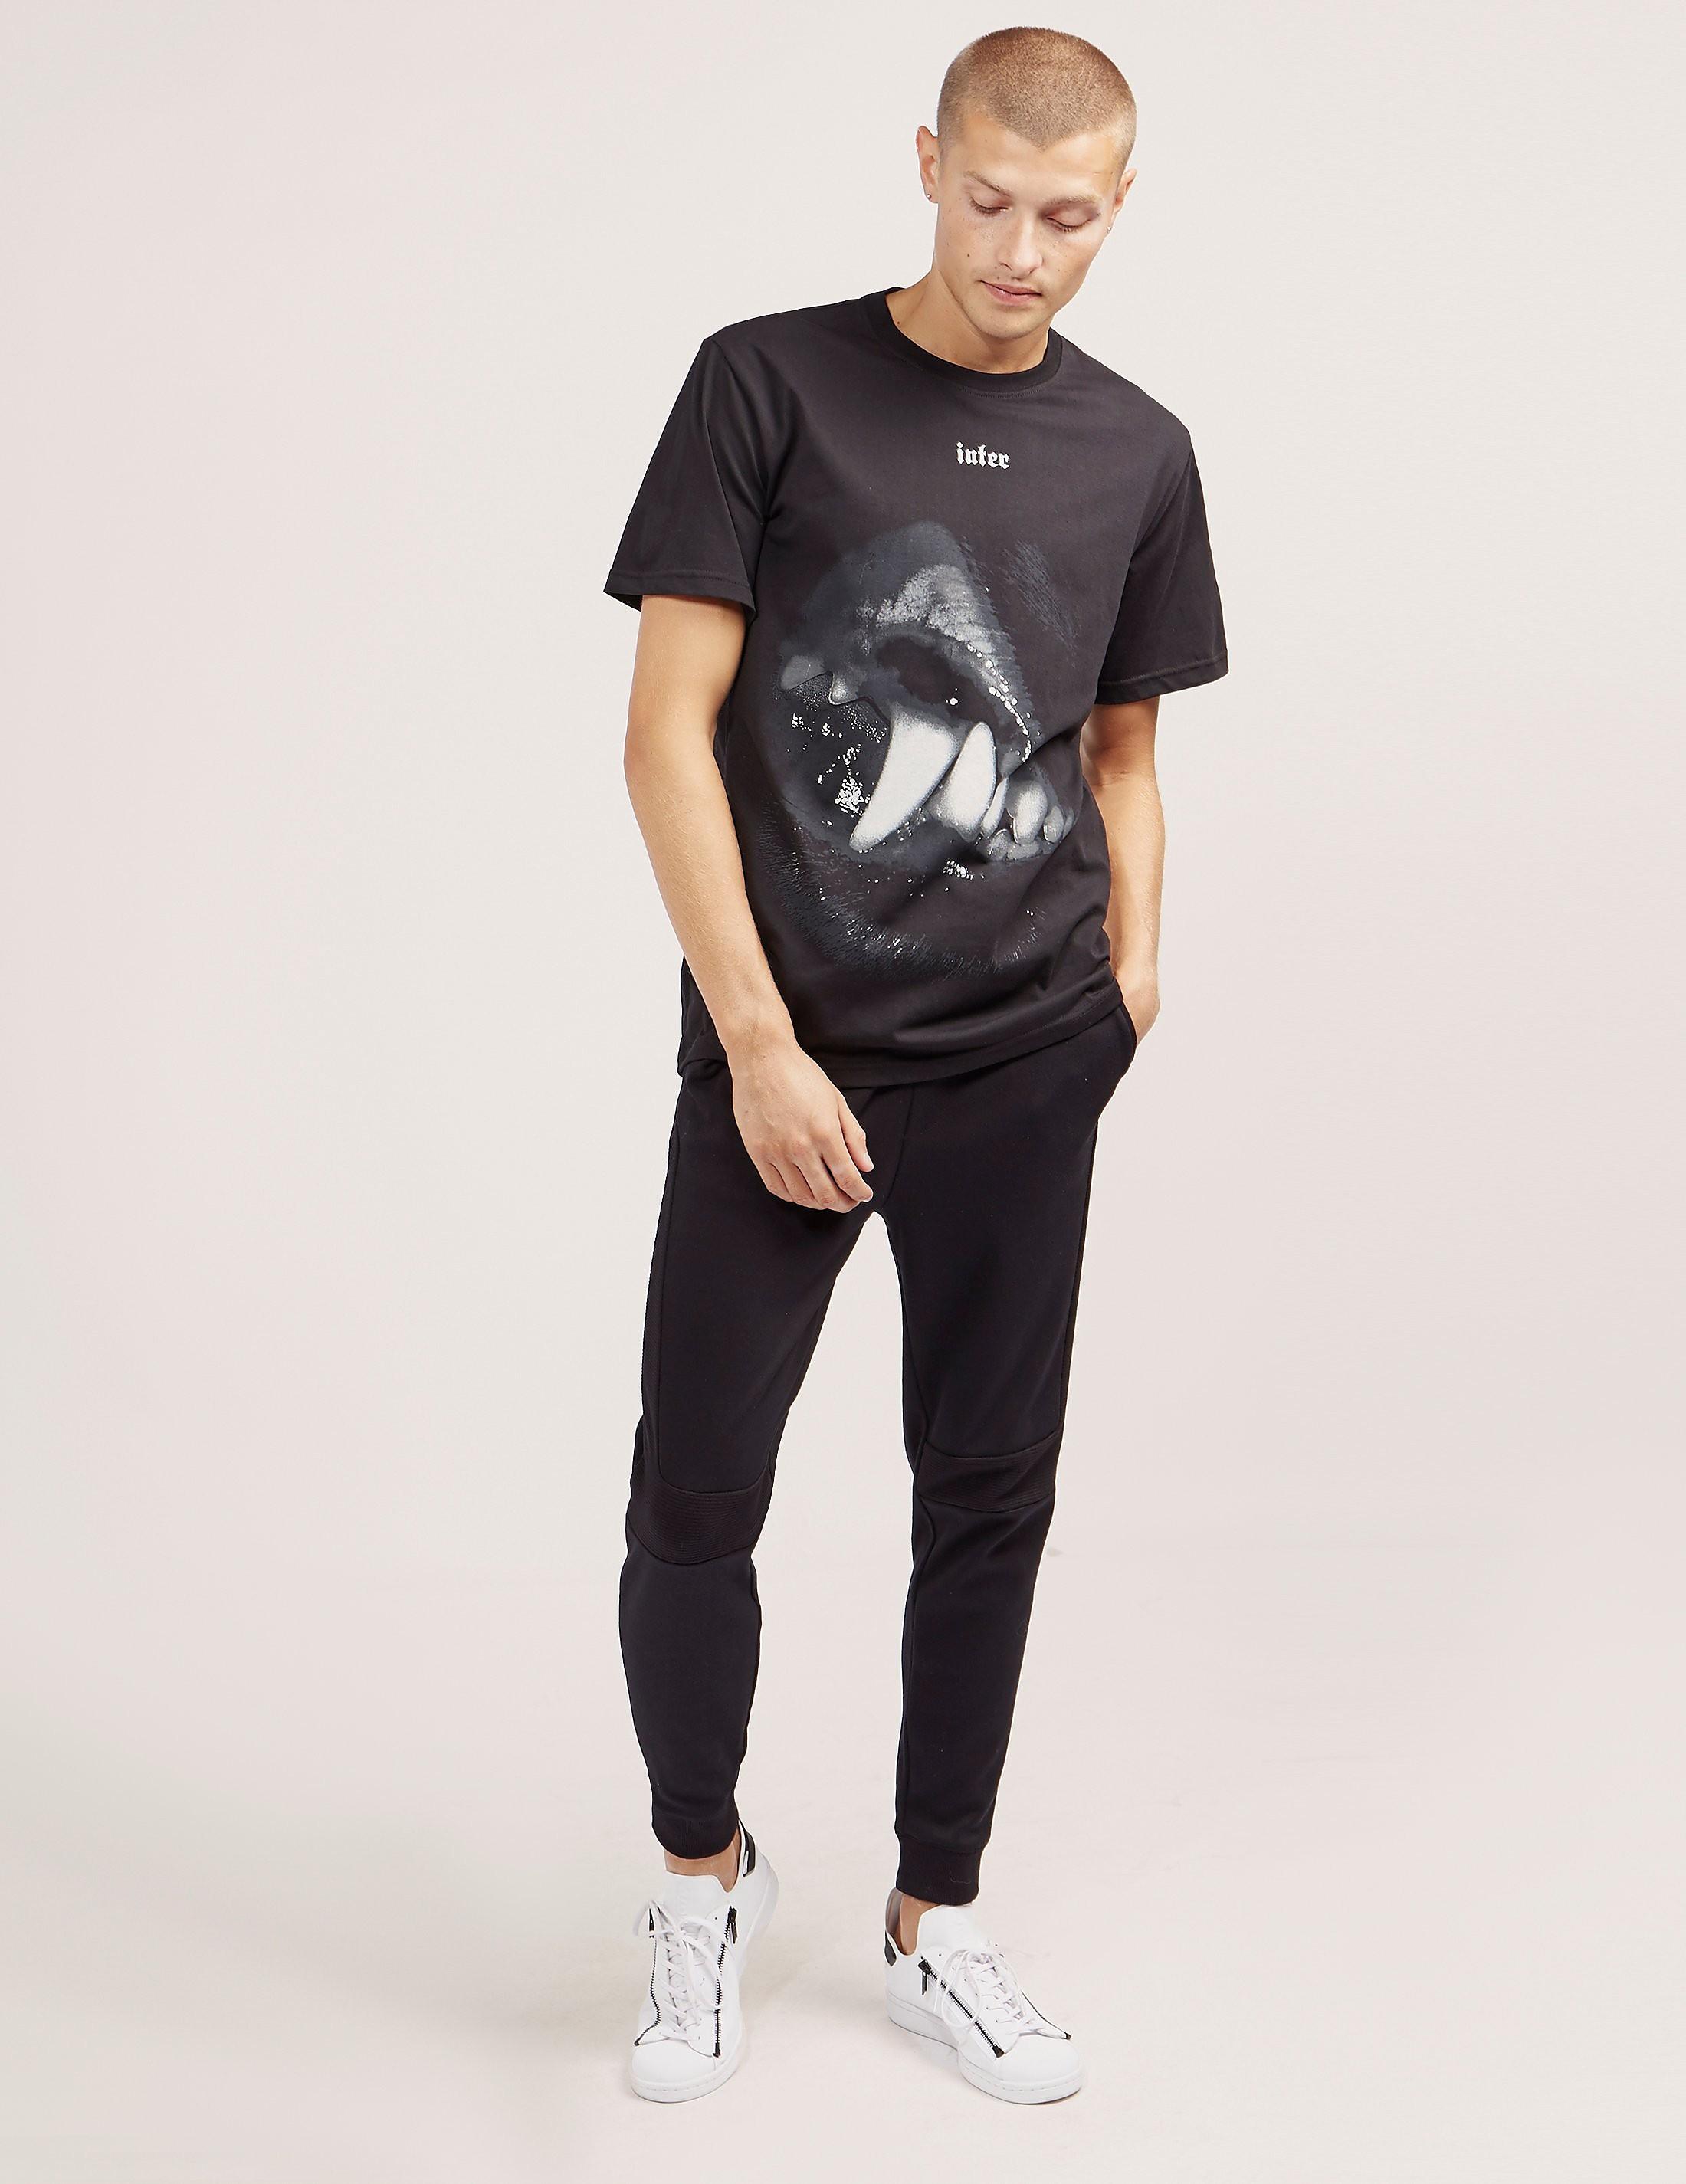 IUTER Snarl Short Sleeve T-Shirt - Exclusive